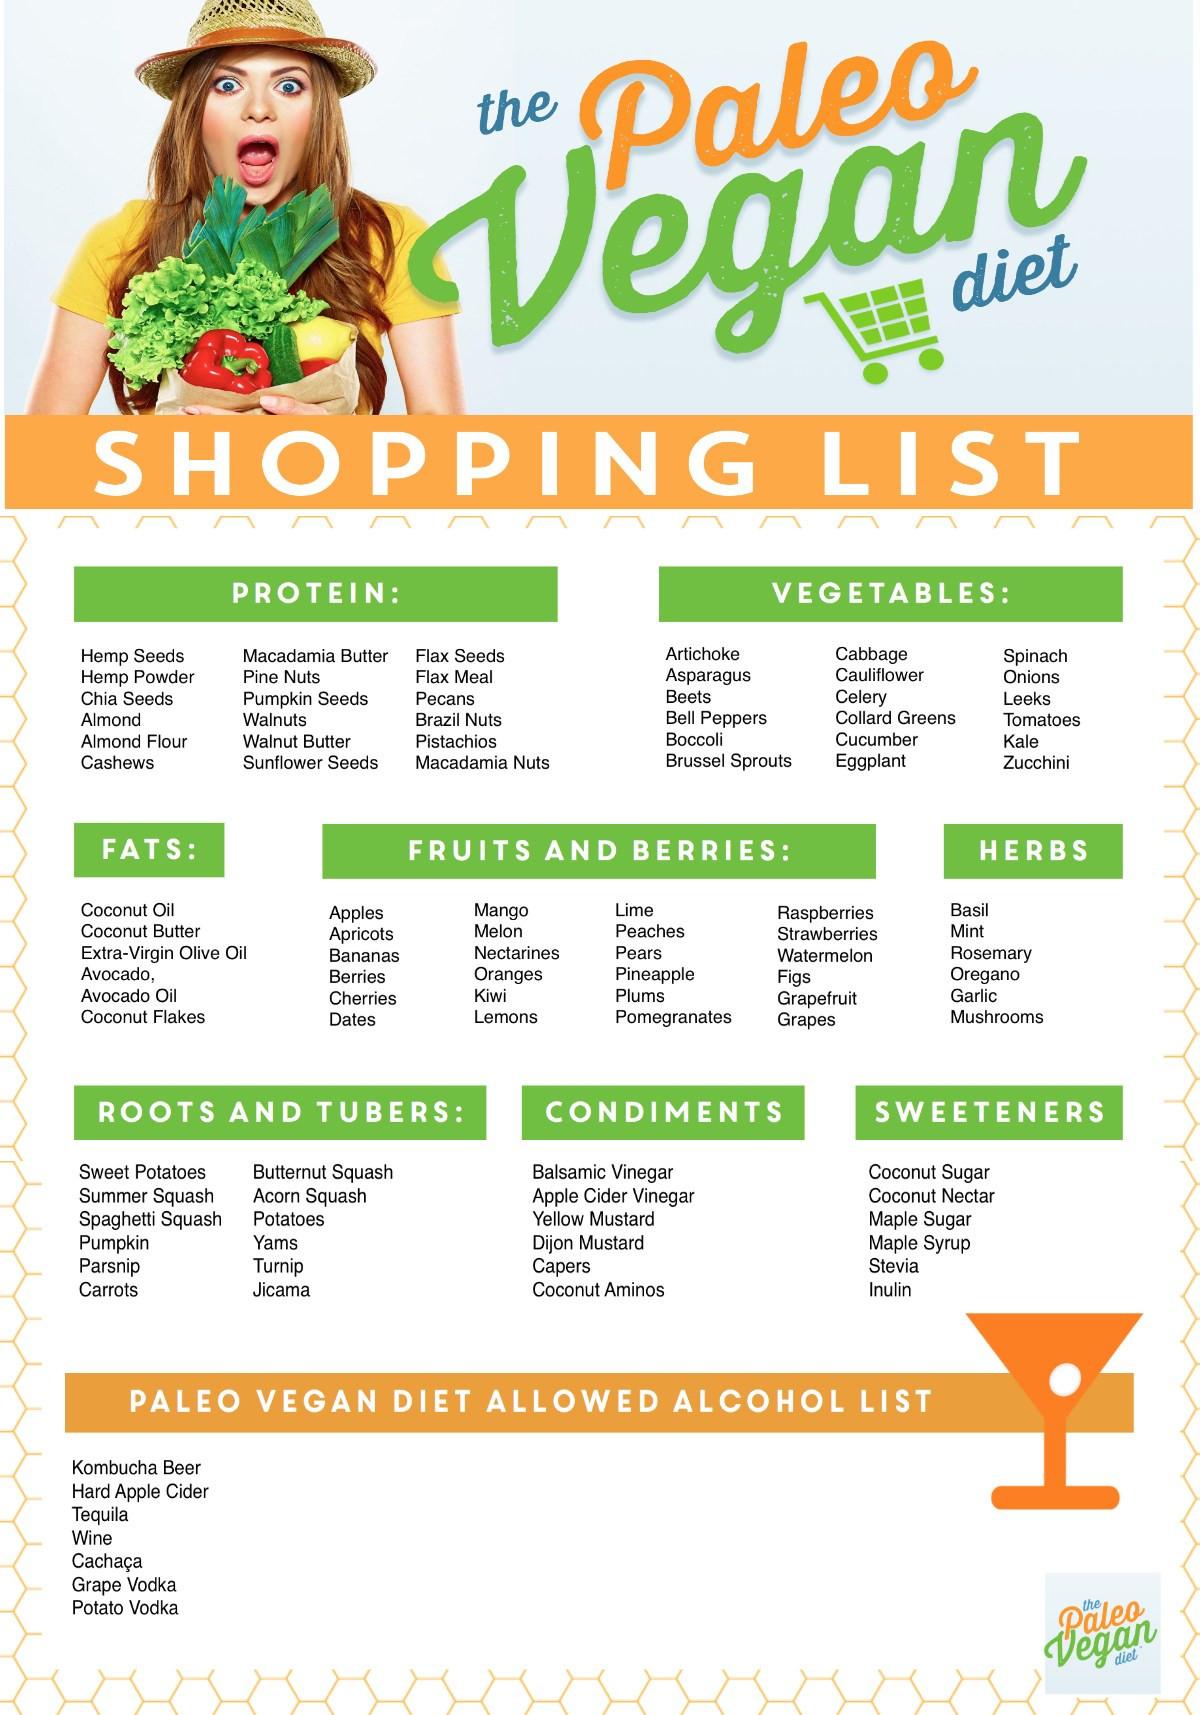 Vegetarian Paleo Diet  Paleo Vegan Diet Foods List Paleo Vegan Diet